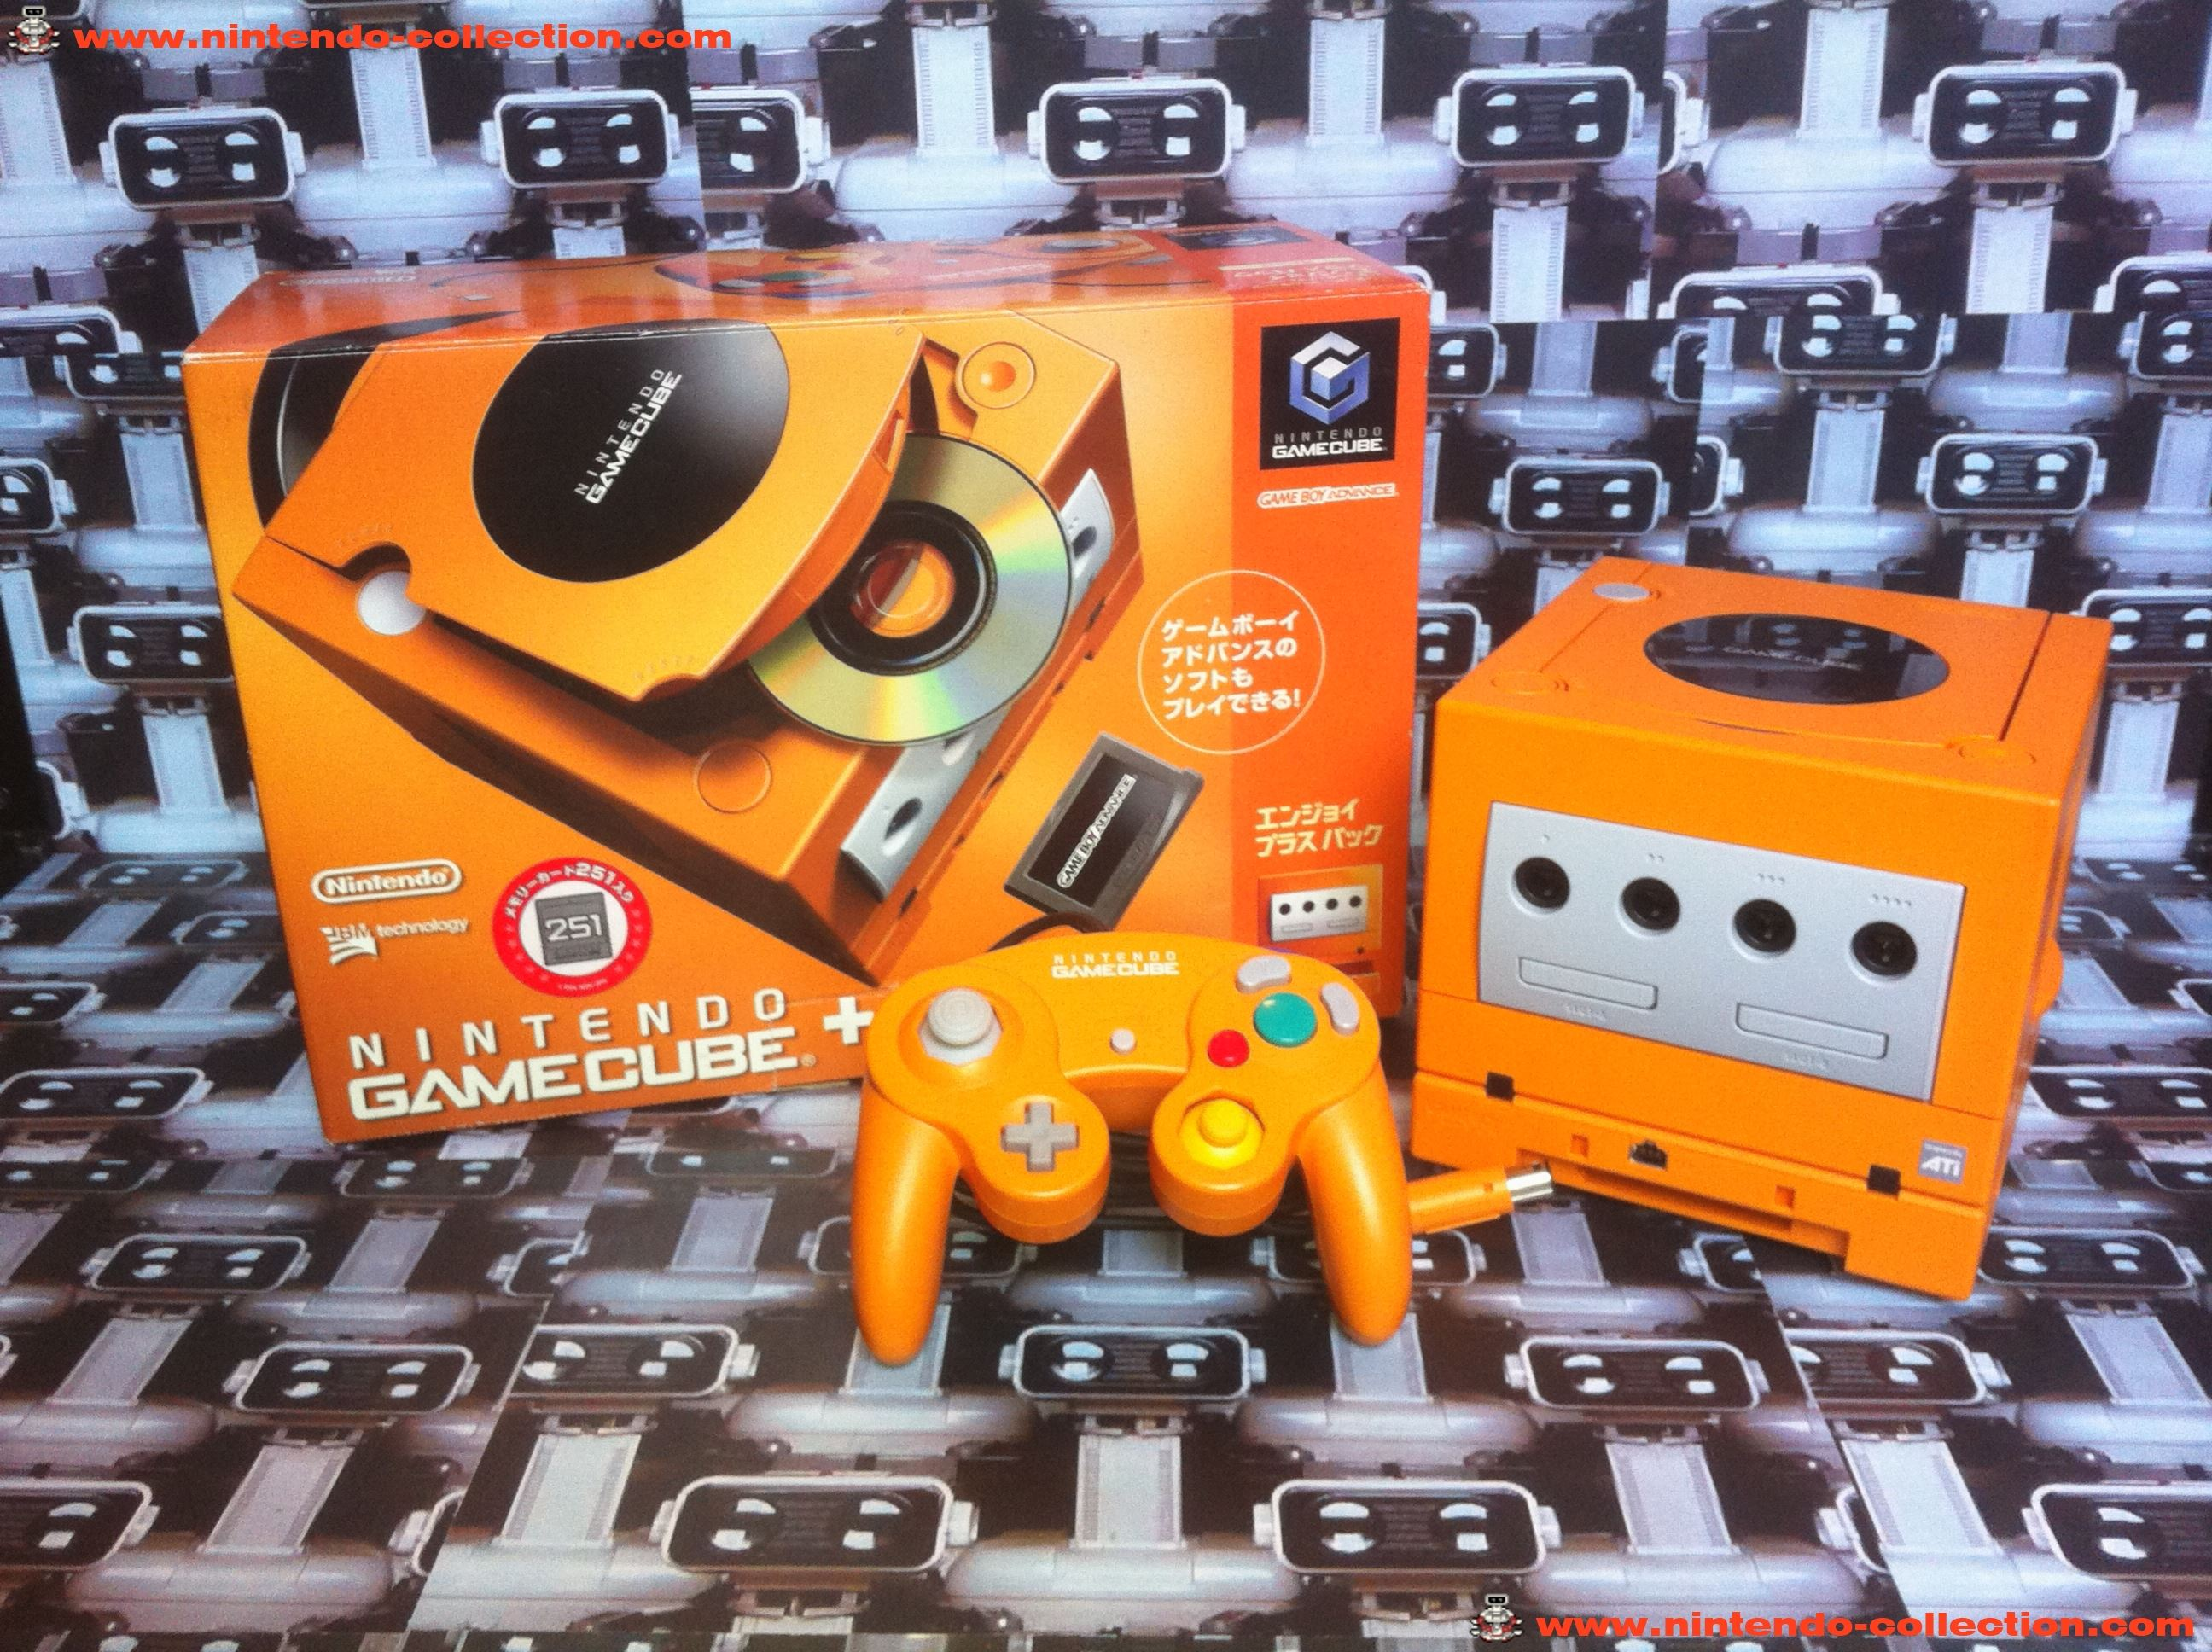 www.nintendo-collection.com - Gamecube  Spice Orange Gameboy Player Edition Japanese Japan Japonaise